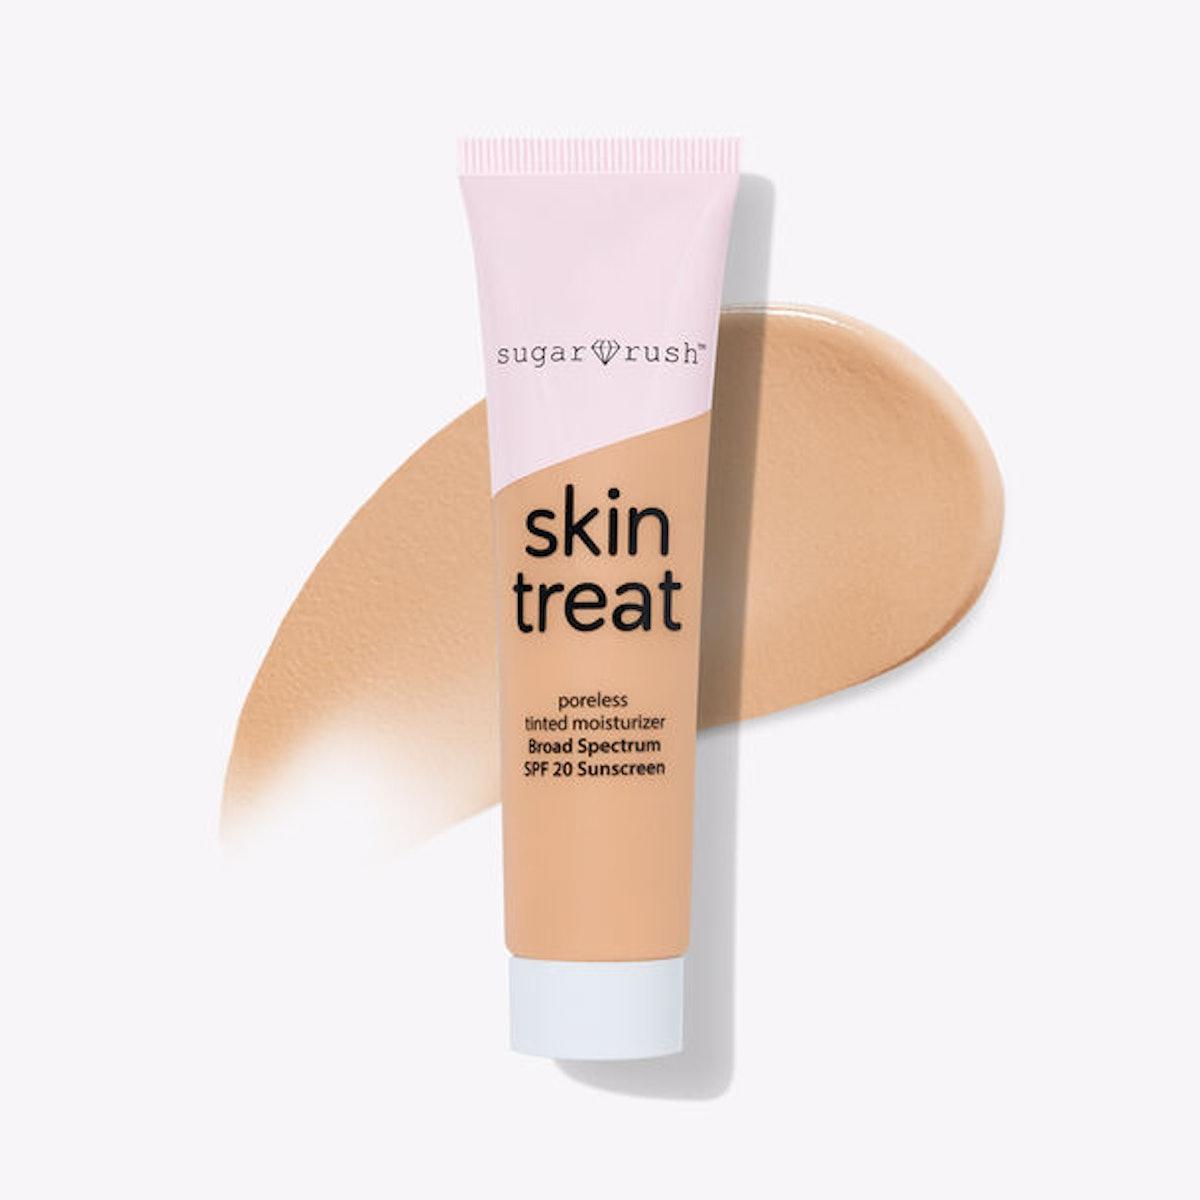 Skin Treat Poreless Tinted Moisturizer Broad Spectrum SPF 20